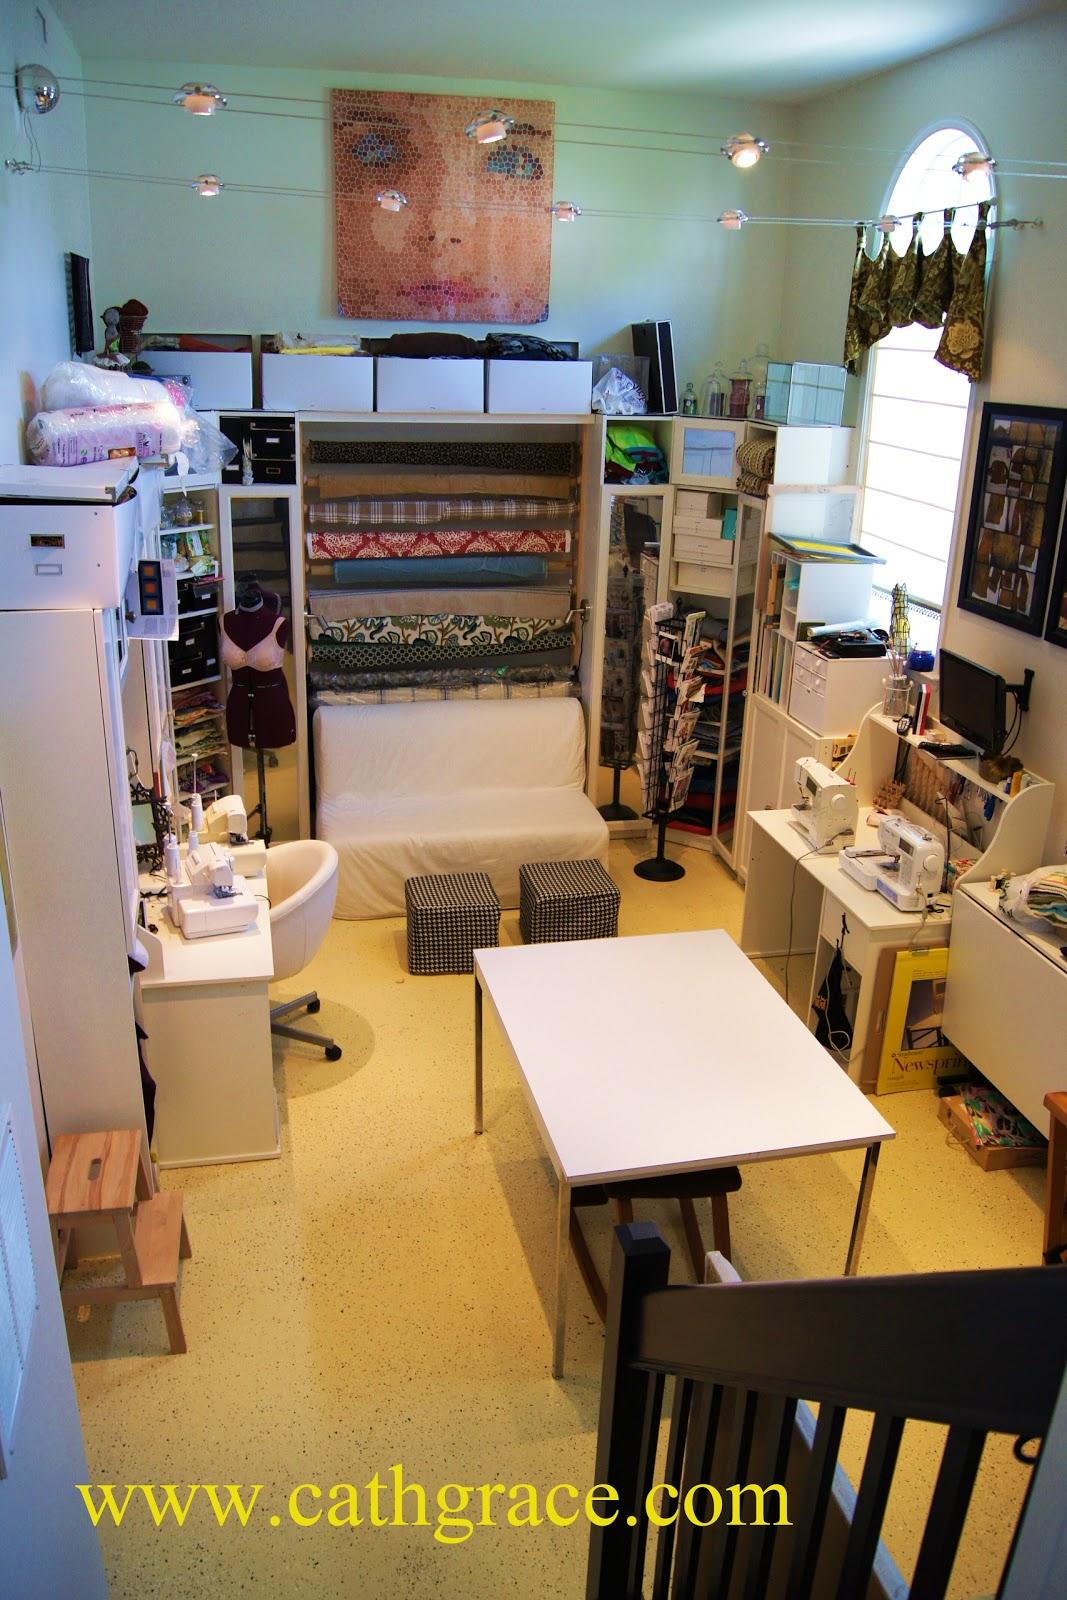 Sewing Room Craft Studio: sewing+room+craft+studio My,My Sewing Room   Craft Studio   cathgrace